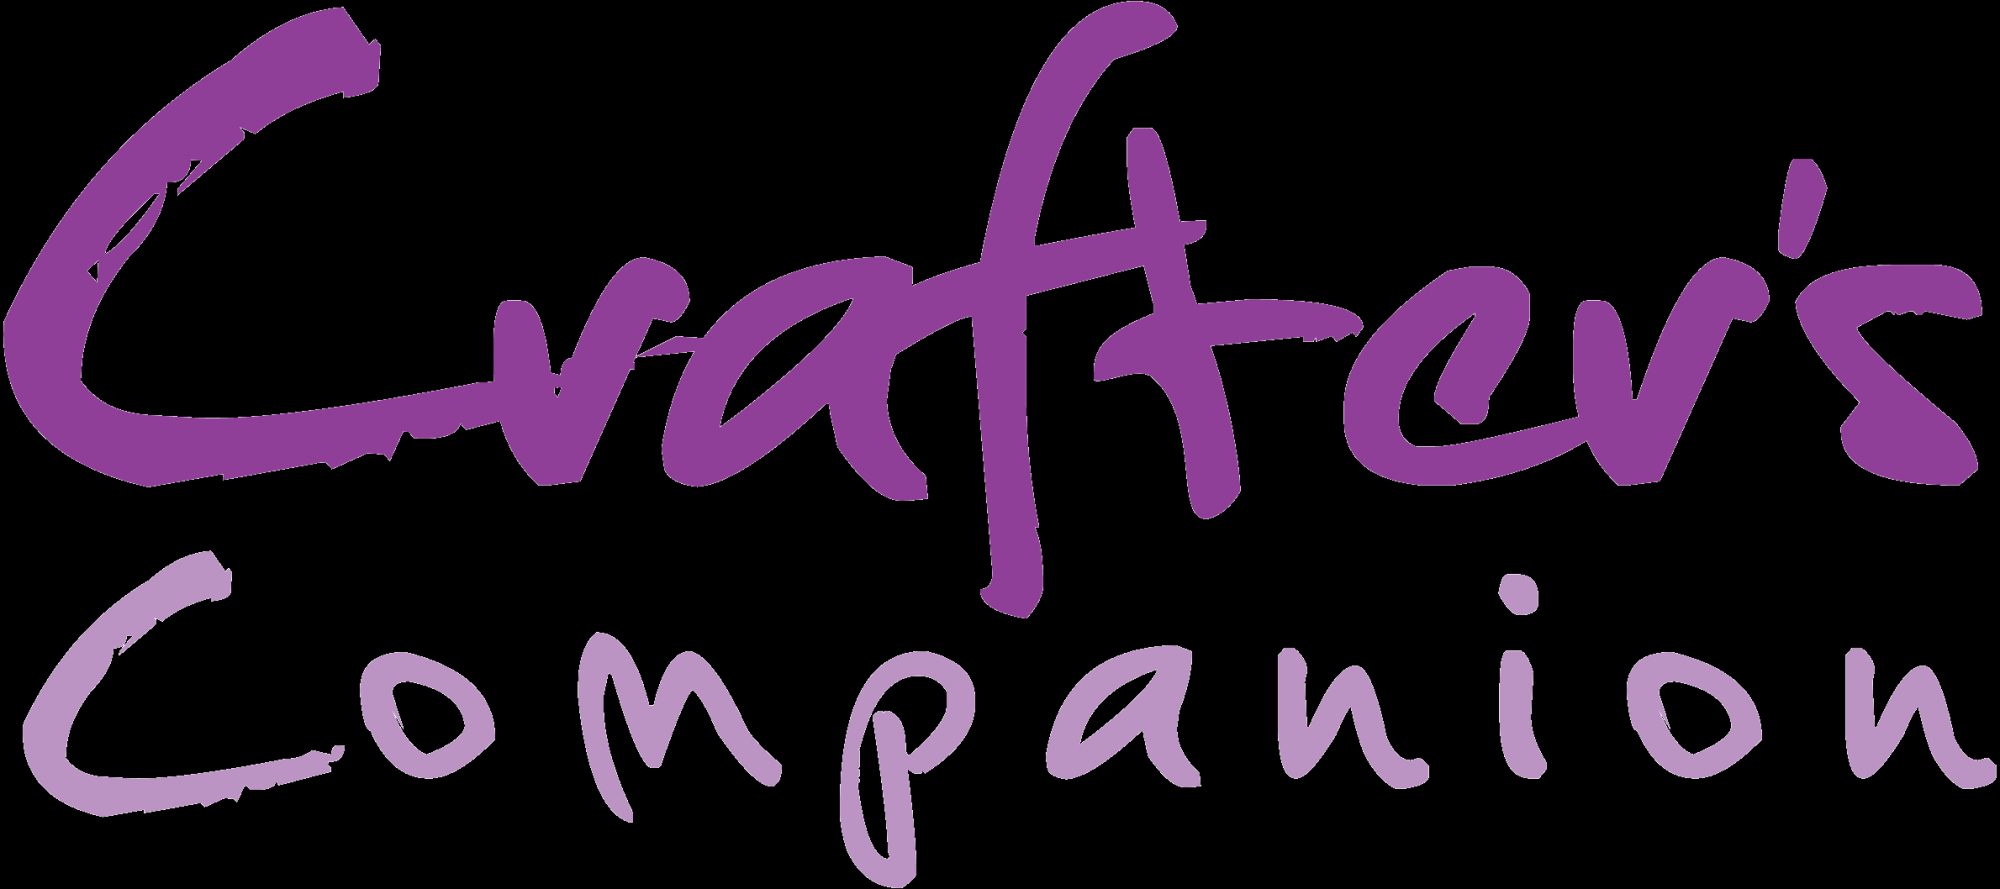 Crafters Companion - Rozzan Scrapbooking